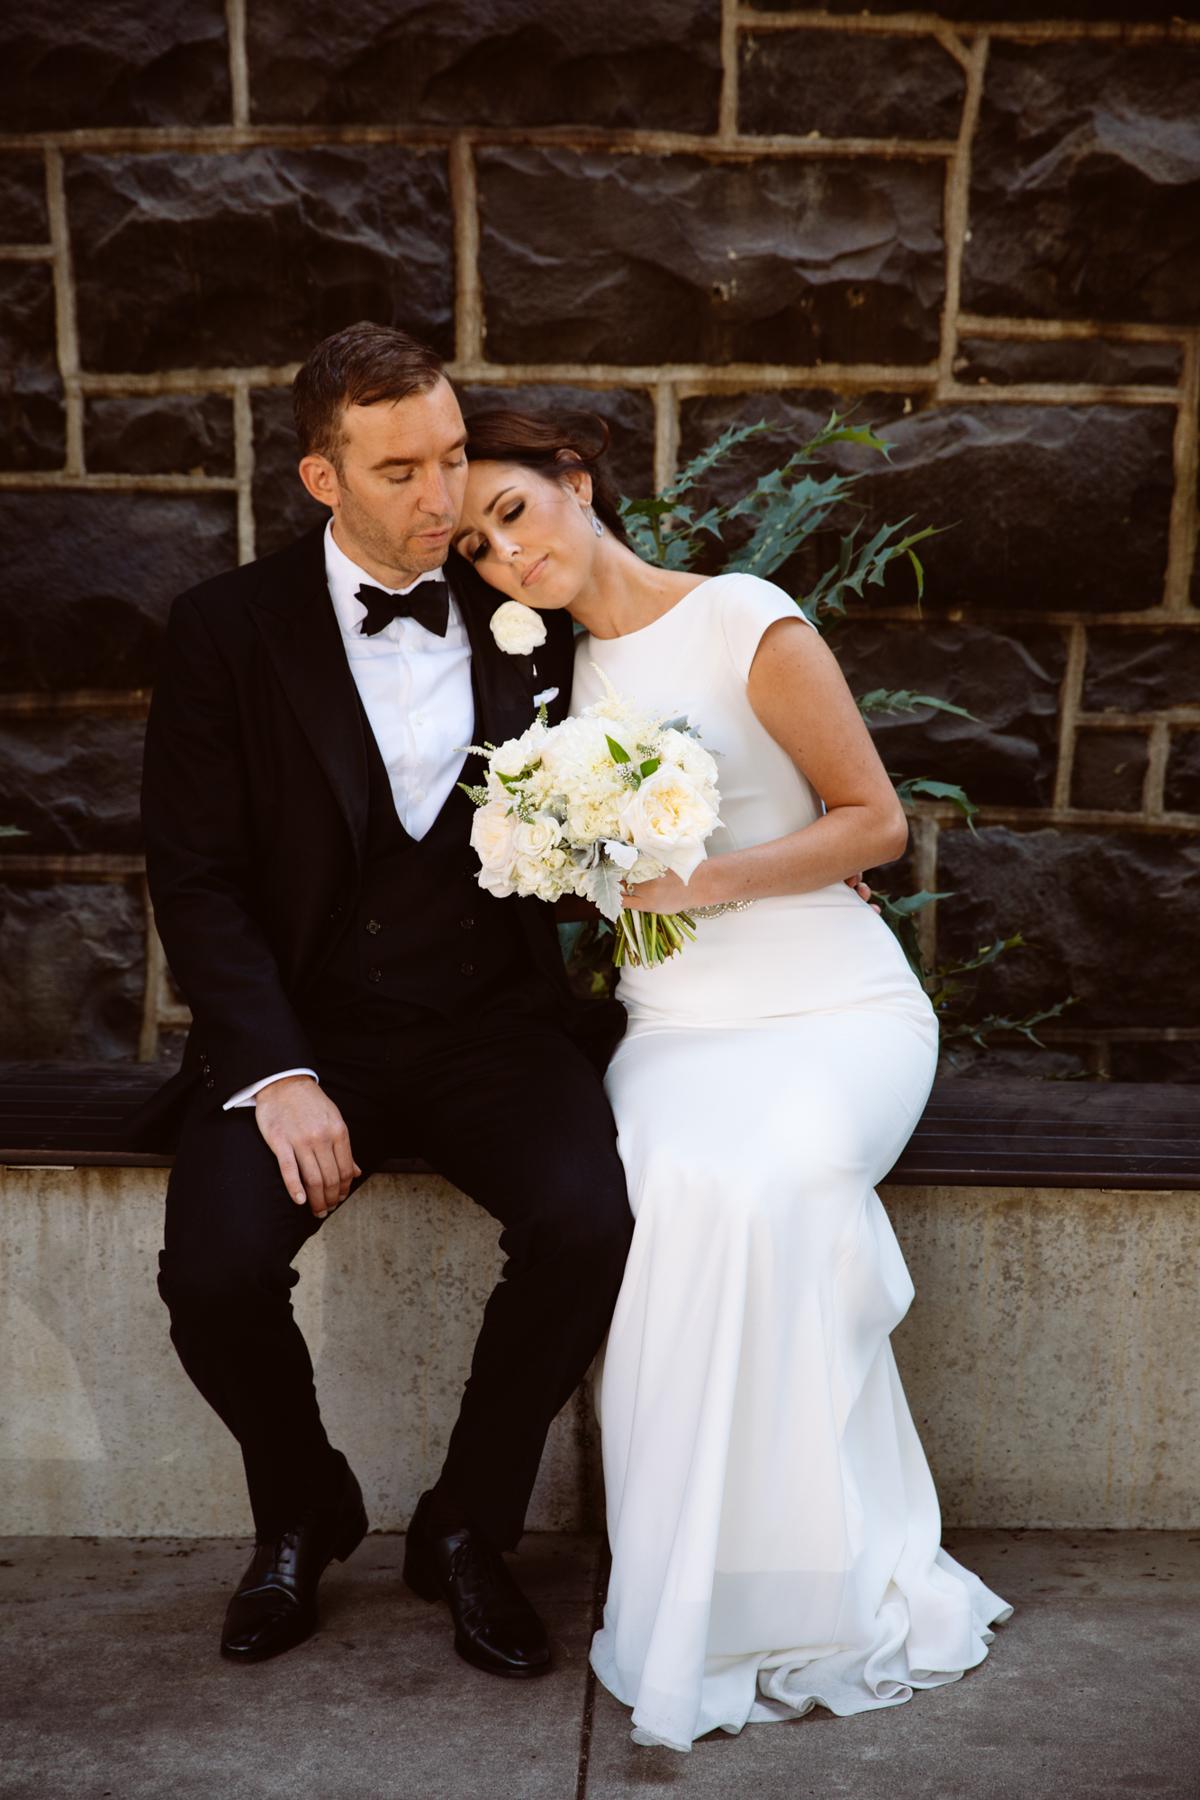 Barrick-Shinabarger-Wedding-151.jpg